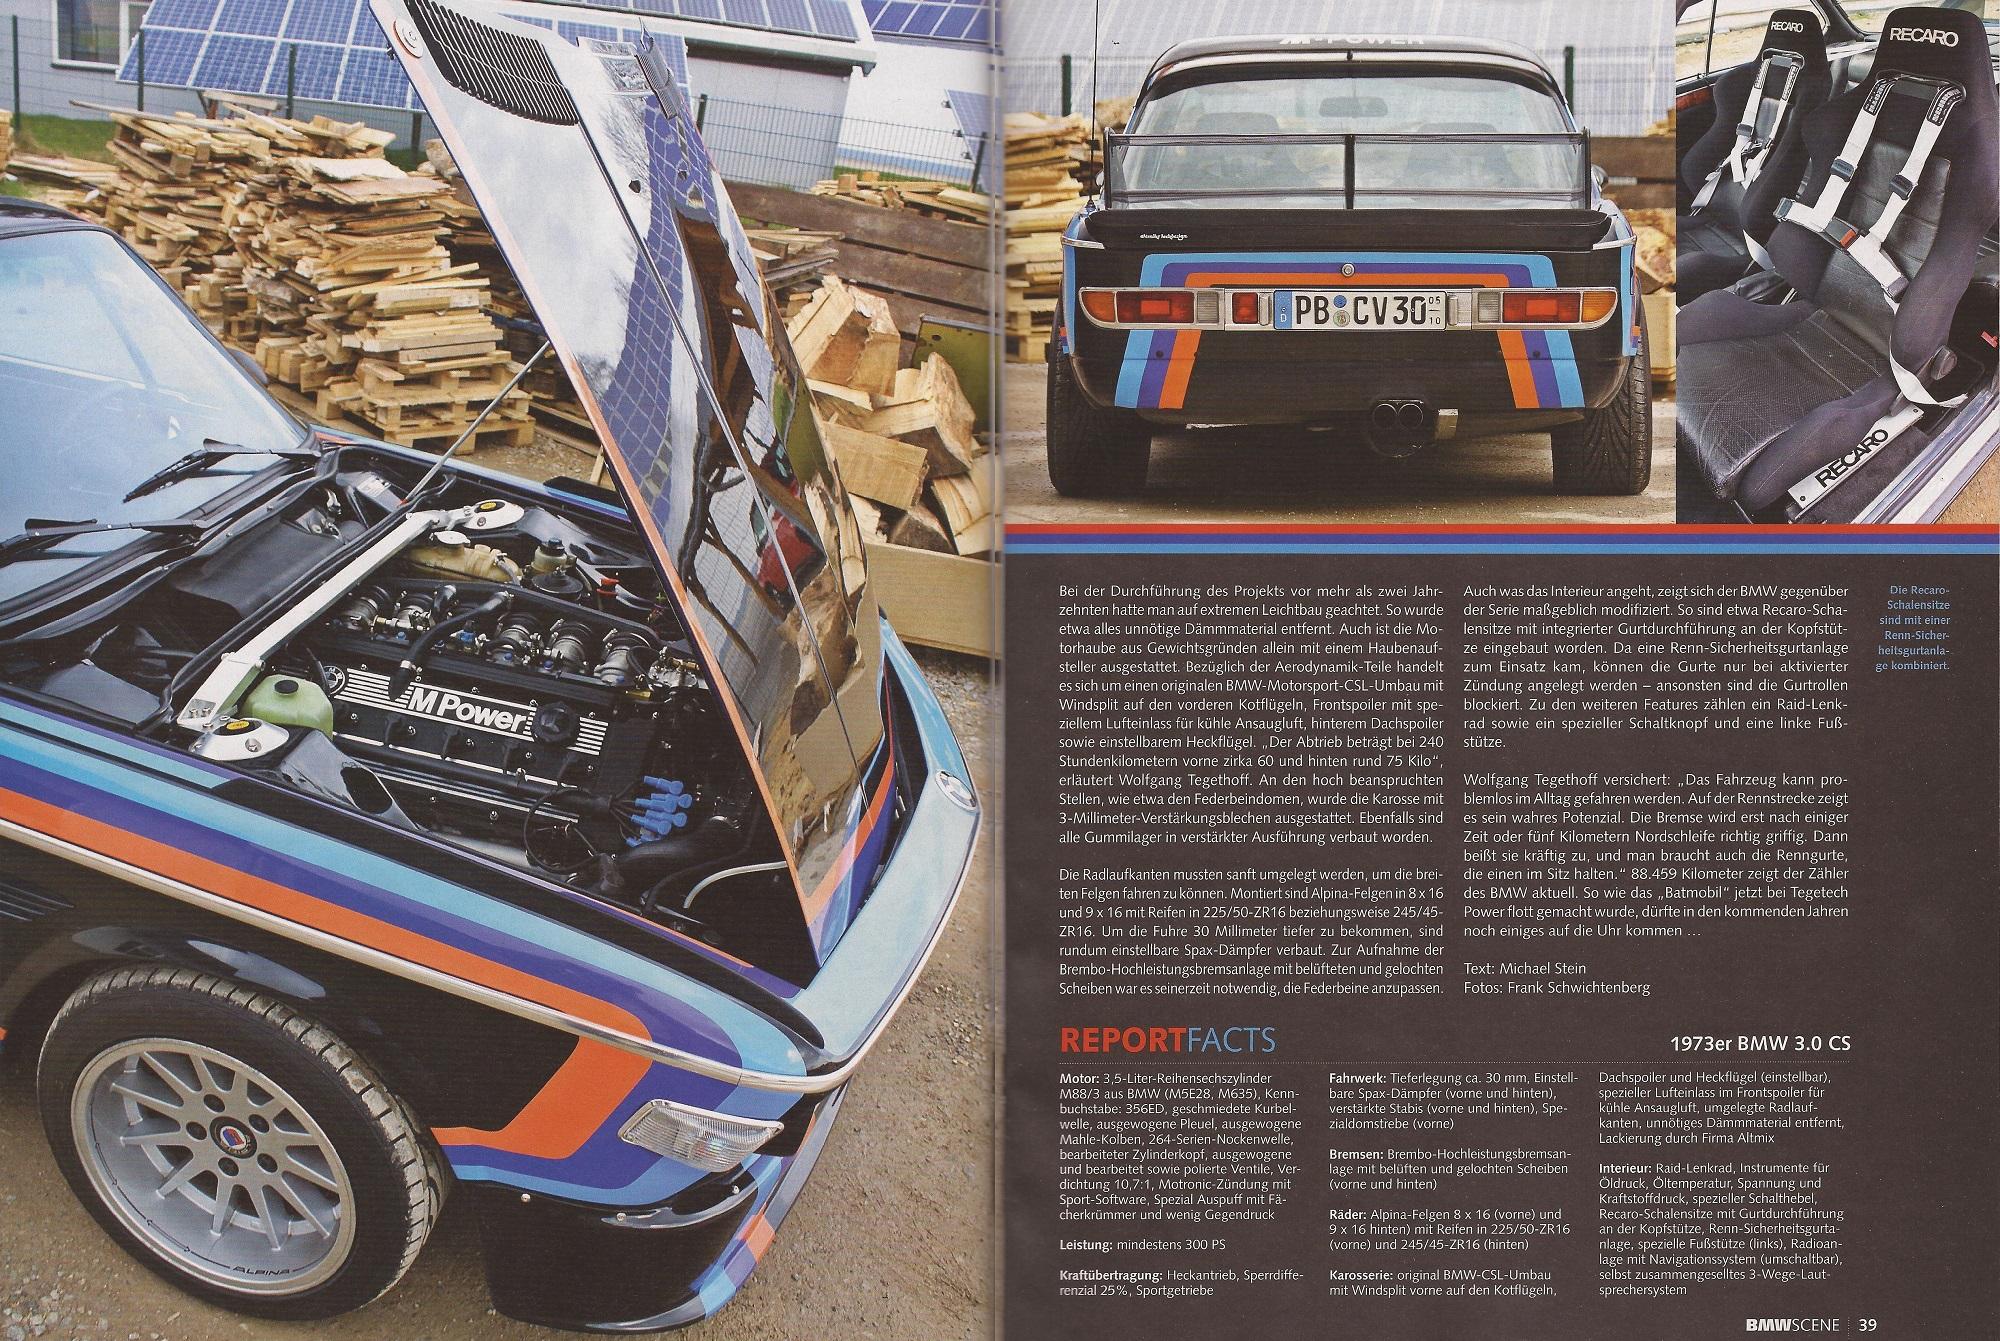 Bmw Magazine Bmw-magazin-1 Bmw-magazin-2